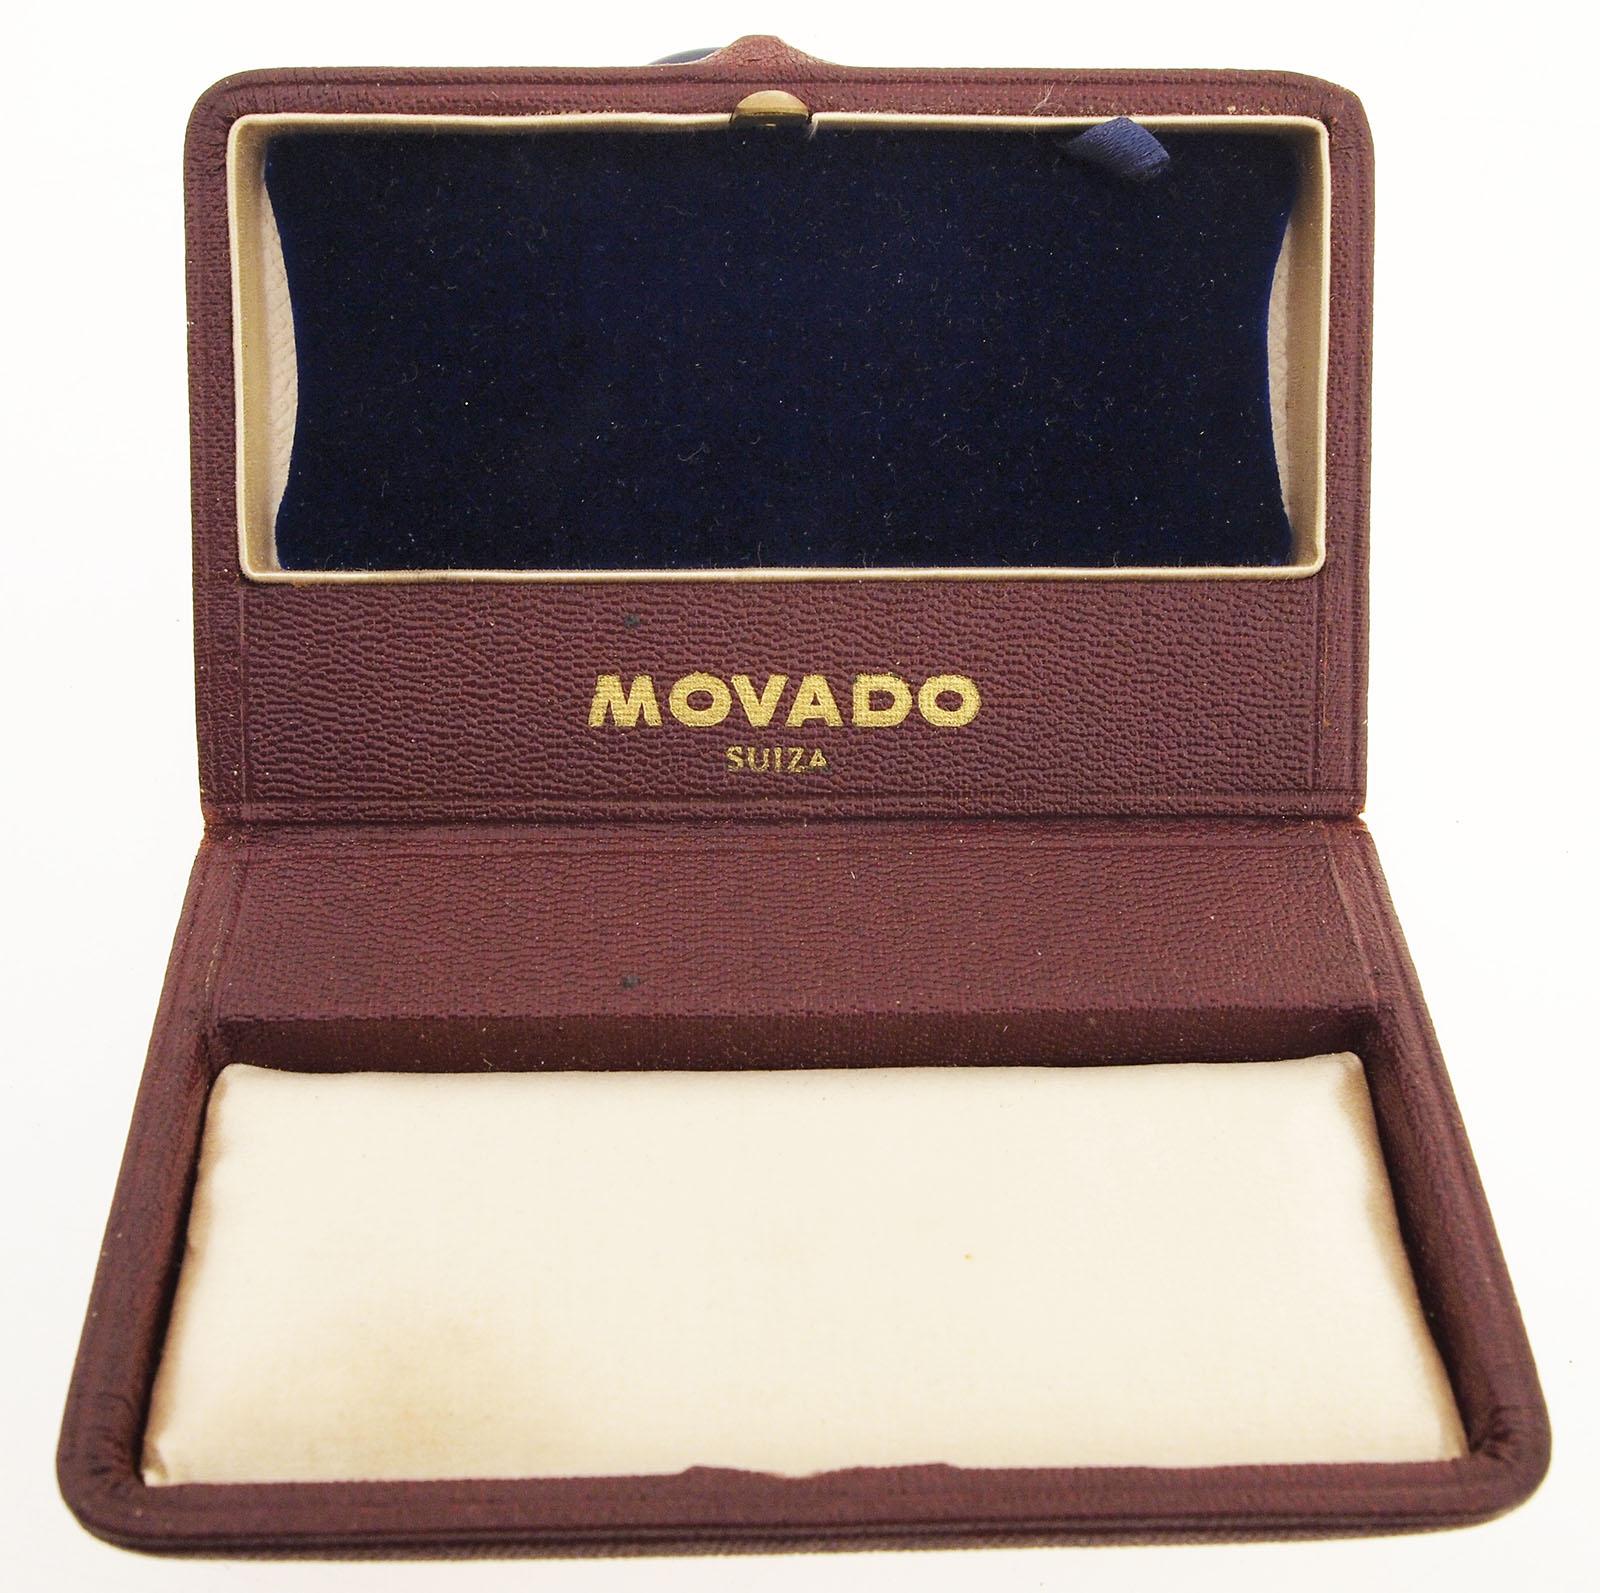 original movado armbanduhren etui box aus den 1960er jahren mit samt seide ebay. Black Bedroom Furniture Sets. Home Design Ideas